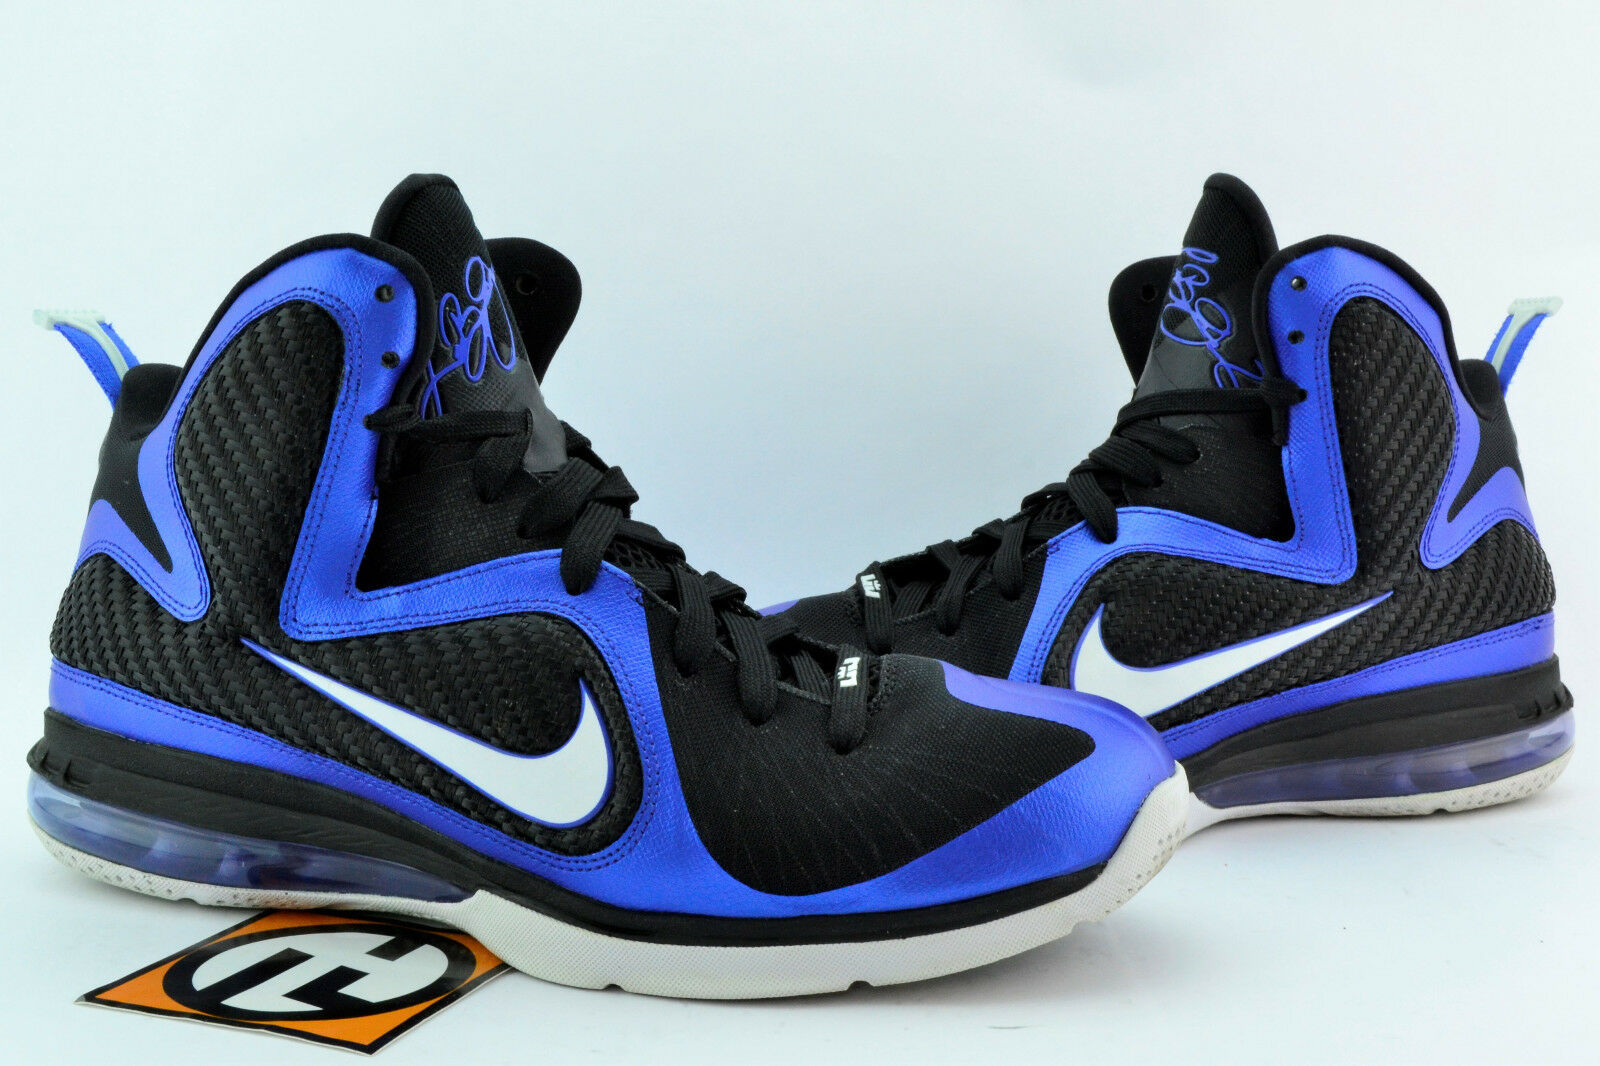 Nike LeBron 9 Kentucky Varsity Royal White Size 10 2011' 469764 400